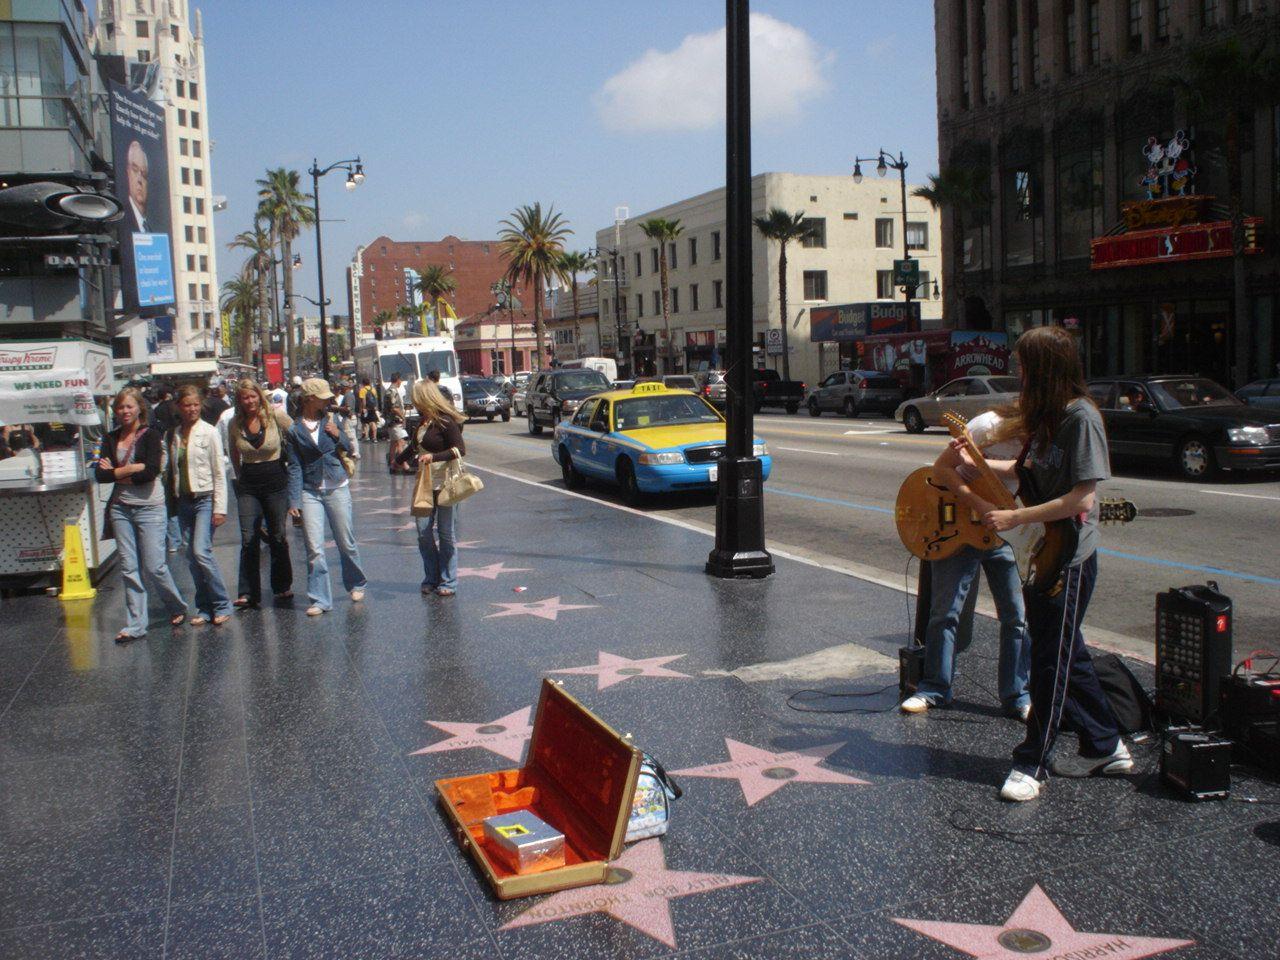 hollywood_walk_of_fame.jpg